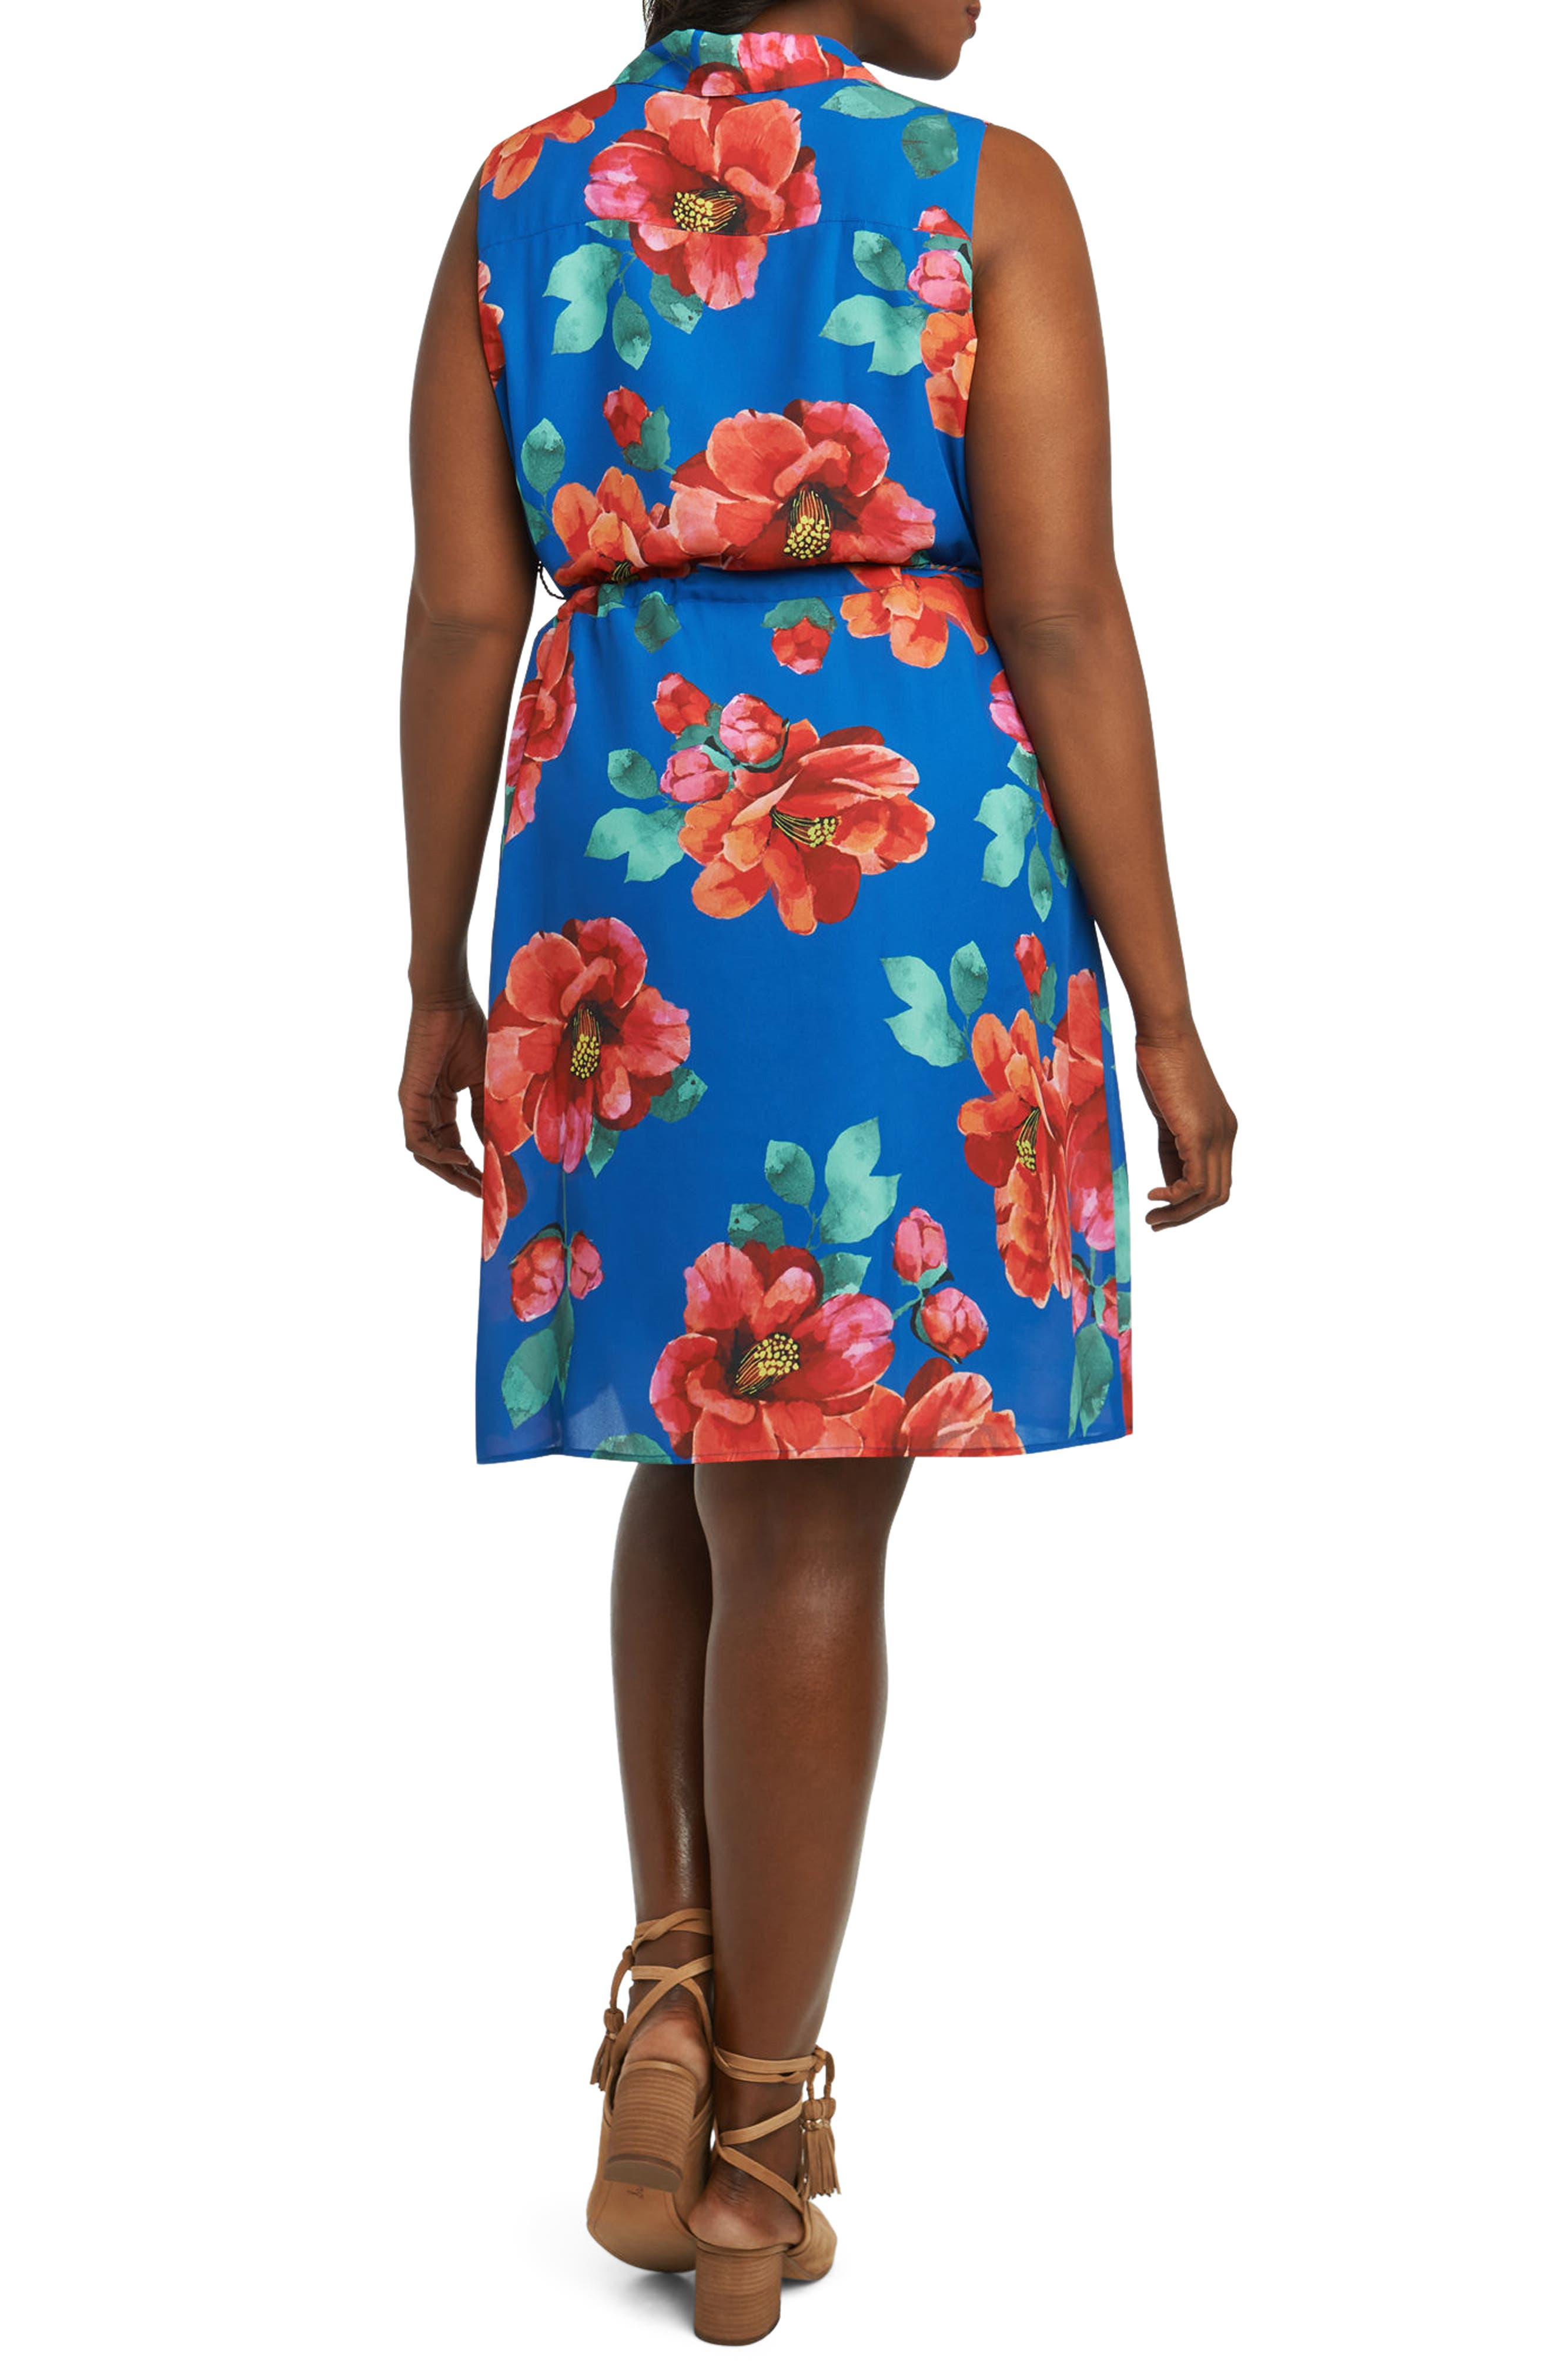 Adessia Hibiscus Floral Tassel Tie Dress,                             Alternate thumbnail 2, color,                             MULTI